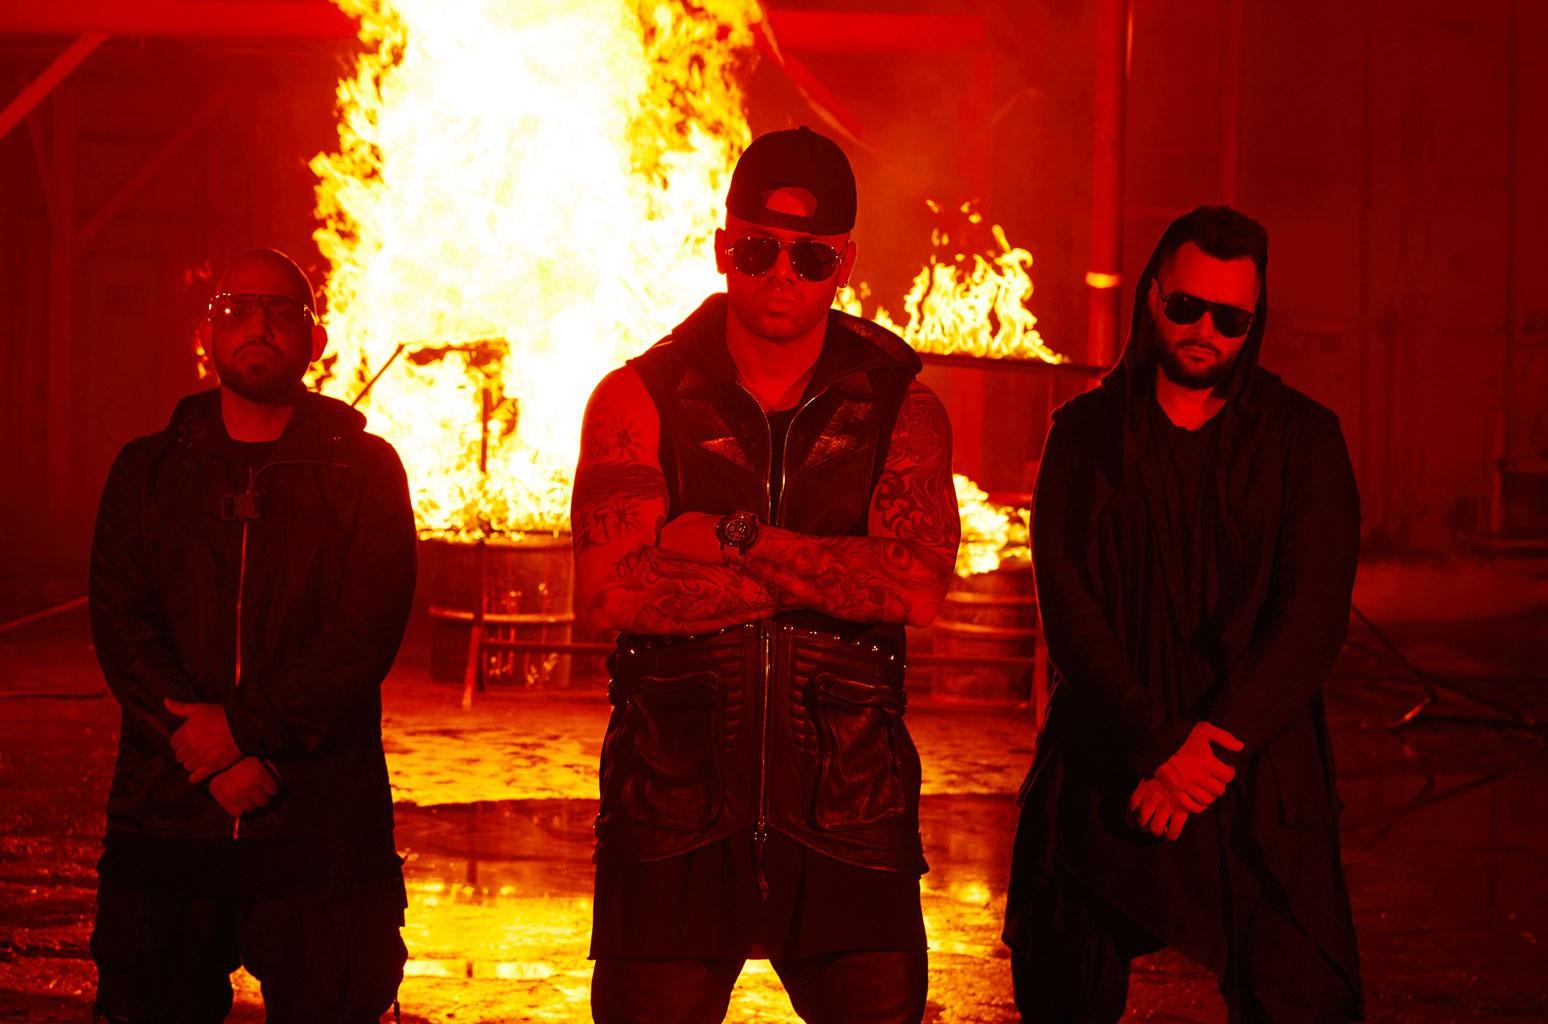 'Fiel' Takes Los Legendarios, Wisin & Jhay Cortez to No. 1 on Latin Airplay Chart